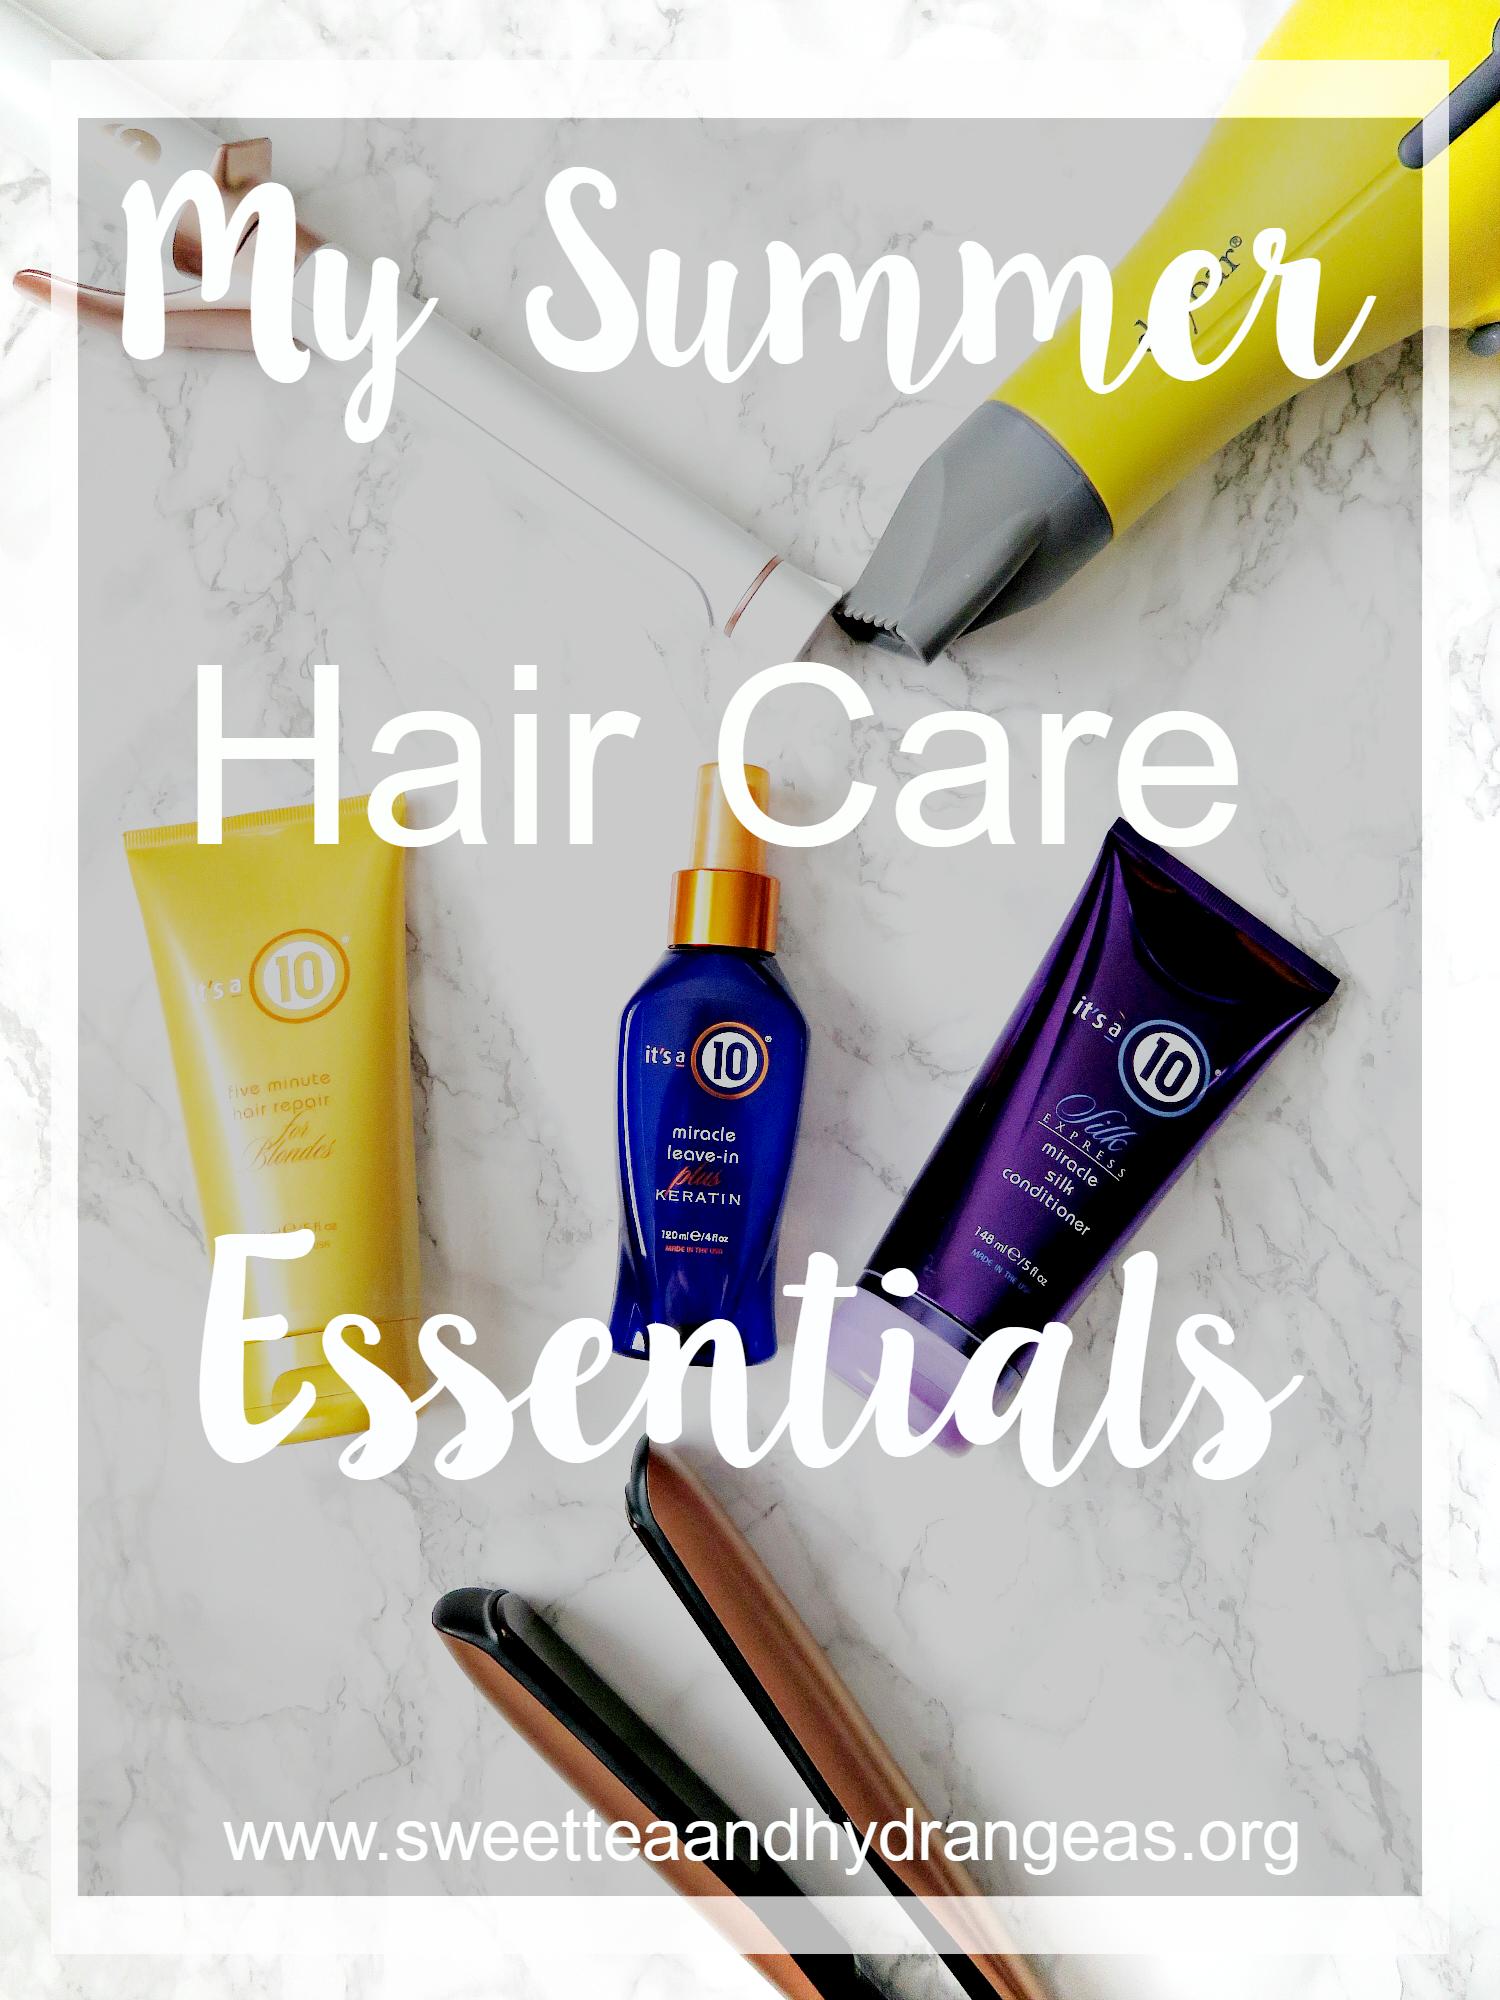 @sweetteaandhydrangeas's cover photo for 'My Summer Hair Care Essentials'